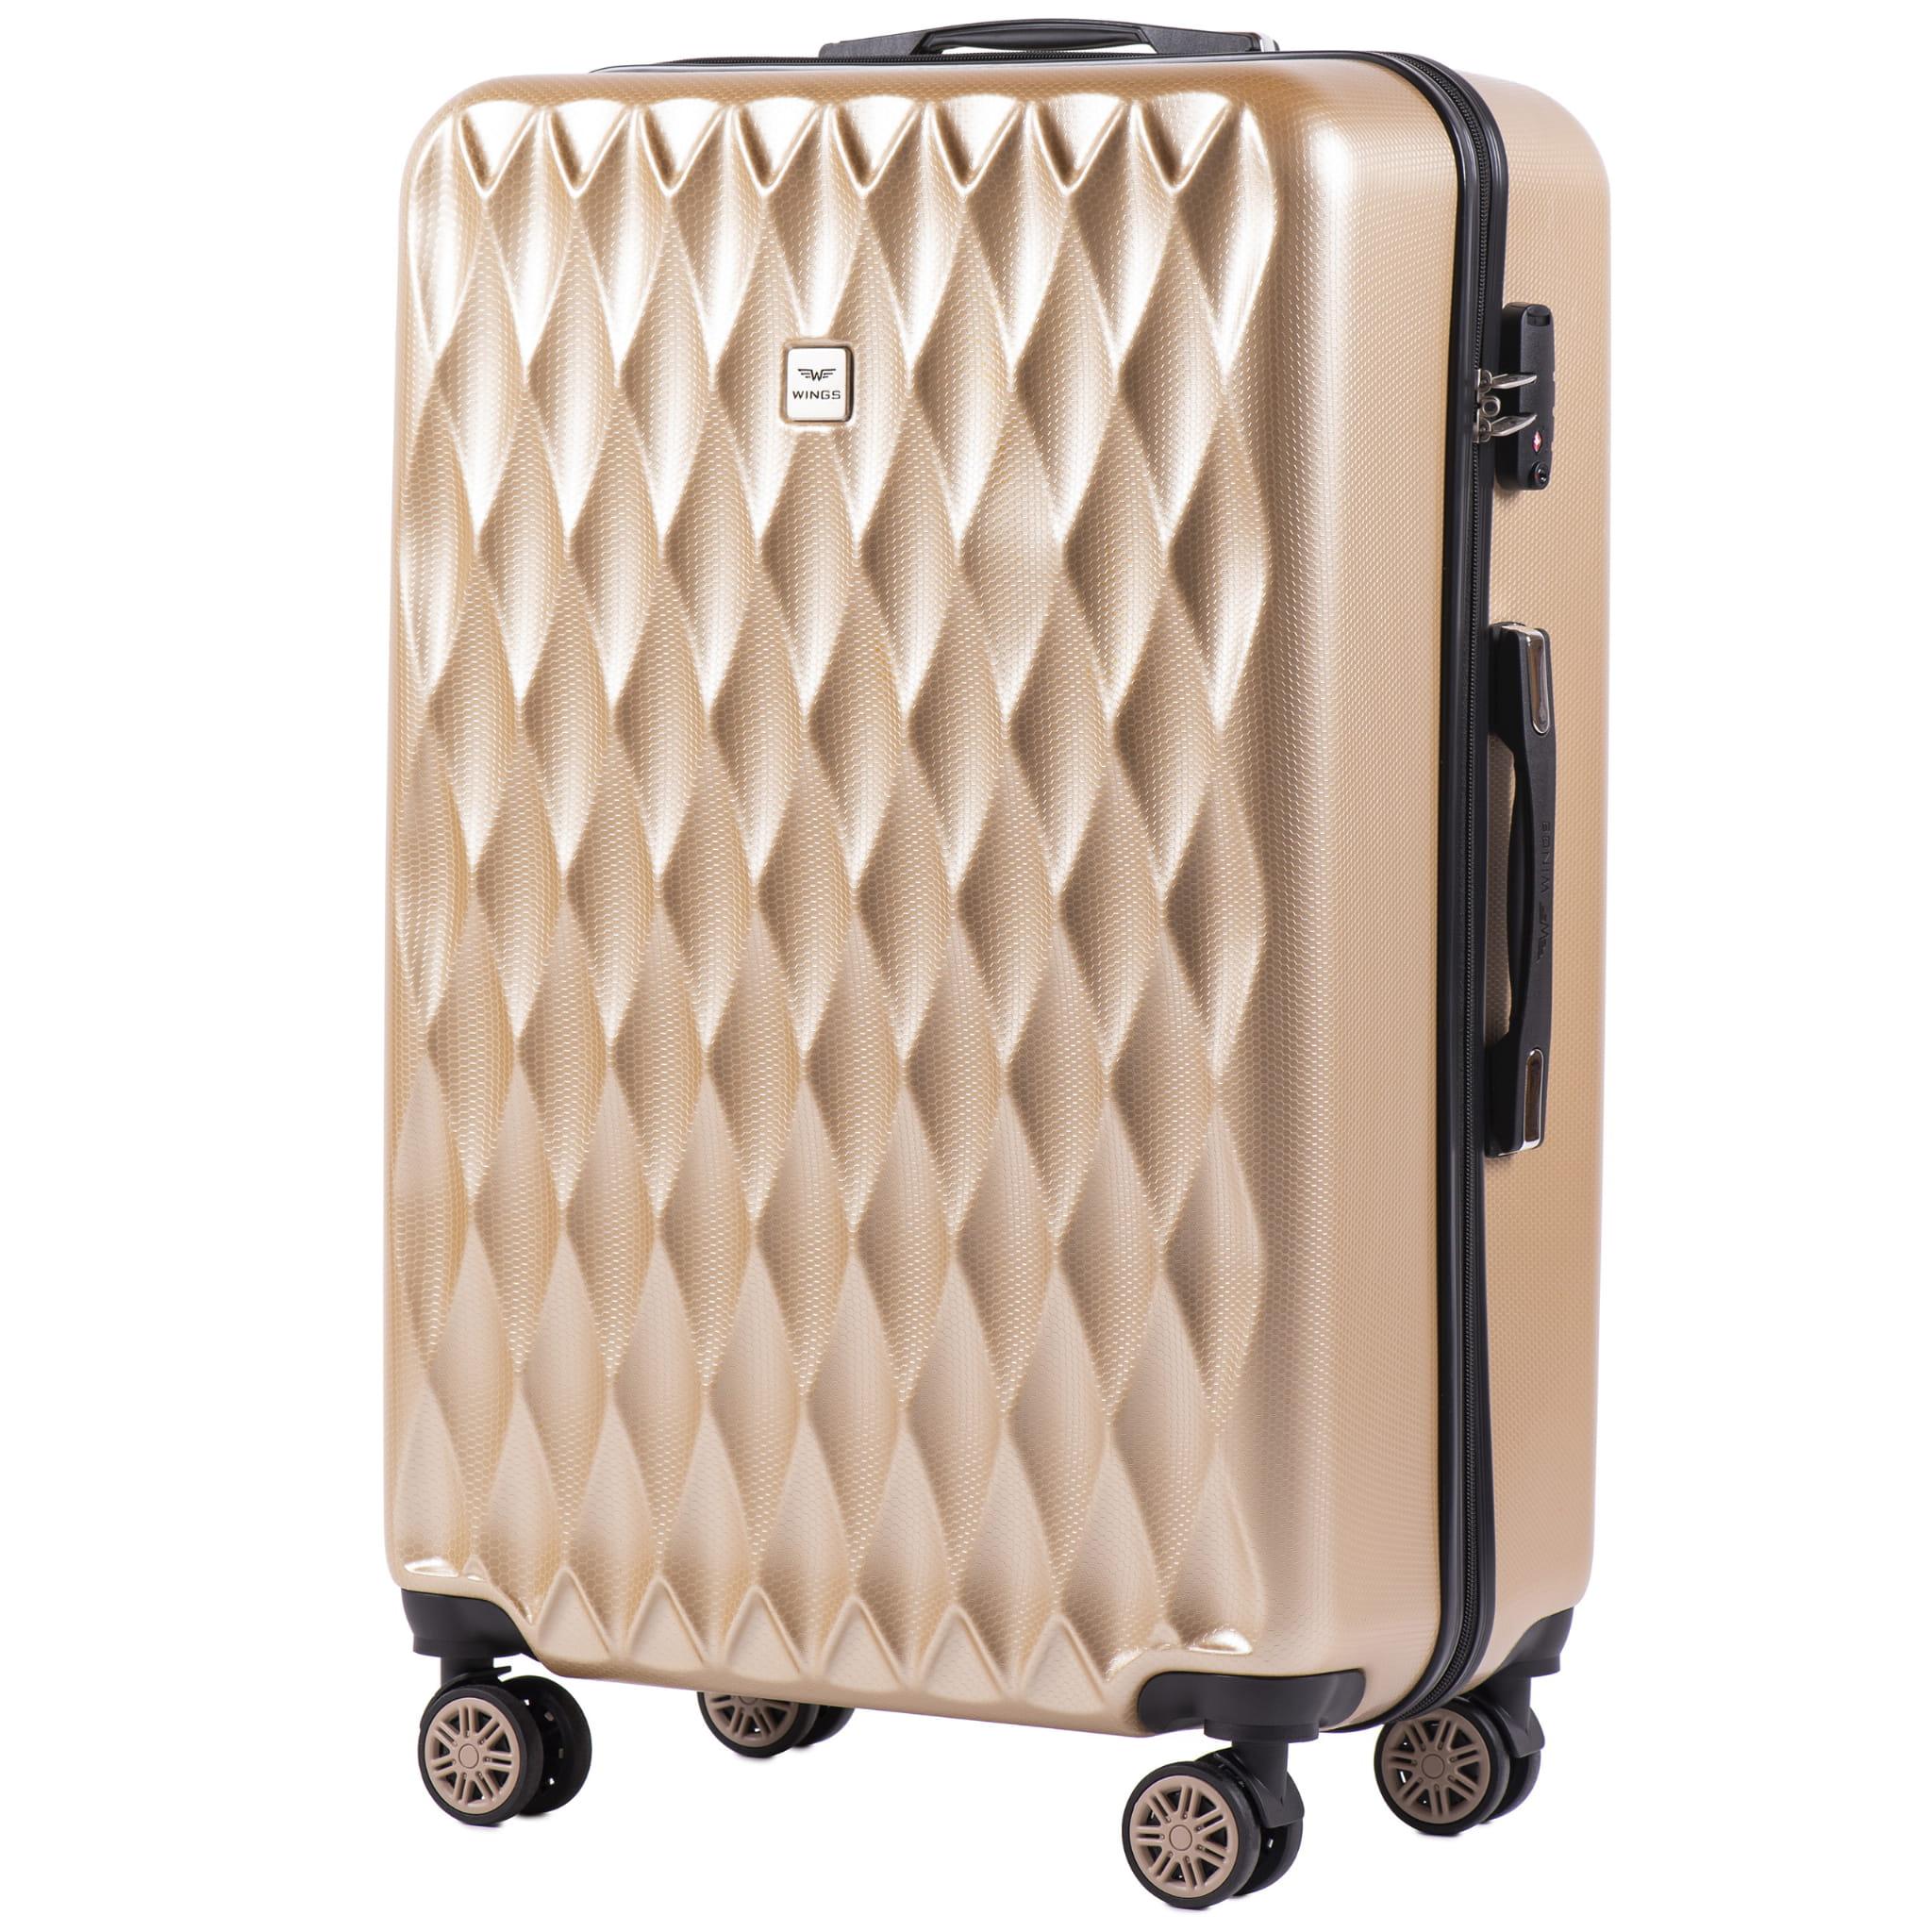 БОЛЬШОЙ ЧЕМОДАН WINGS PC190 L CHAMPANGE  PREMIUM НА 4-Х КАУЧУКОВЫХ КОЛЕСАХ! Для багажа ,до 23 кг!